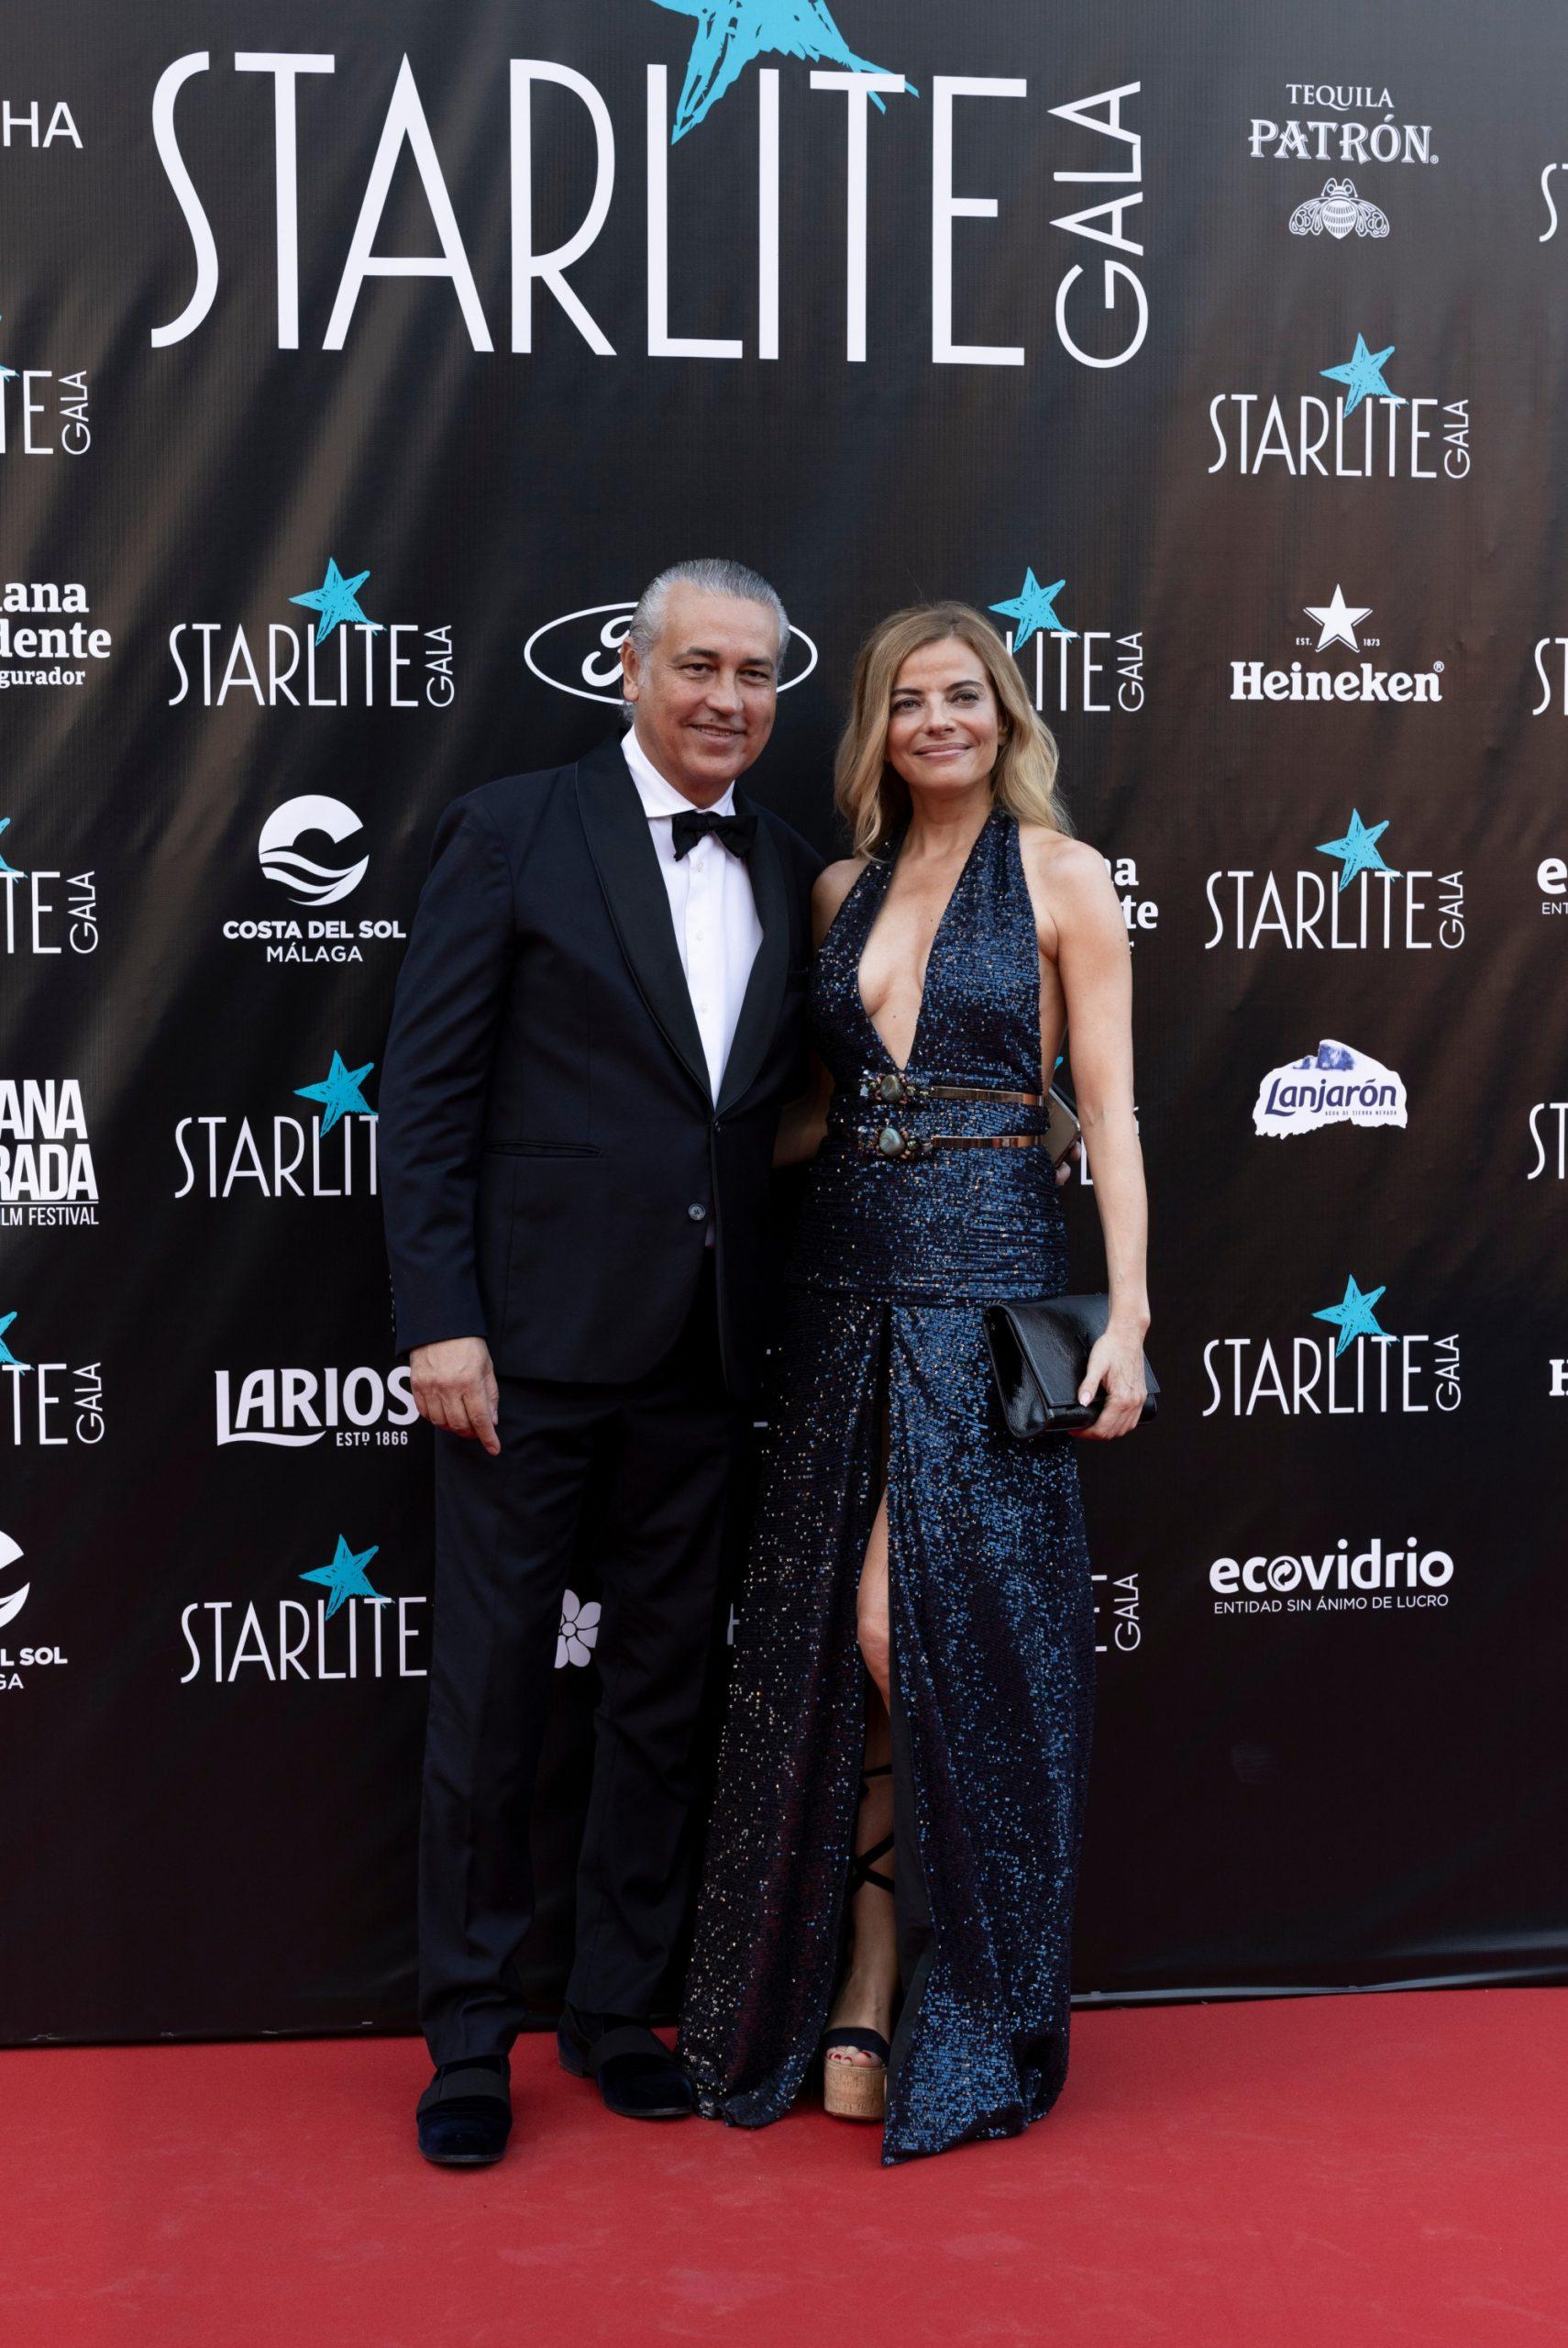 Jorge Planas y Raquel Oliva